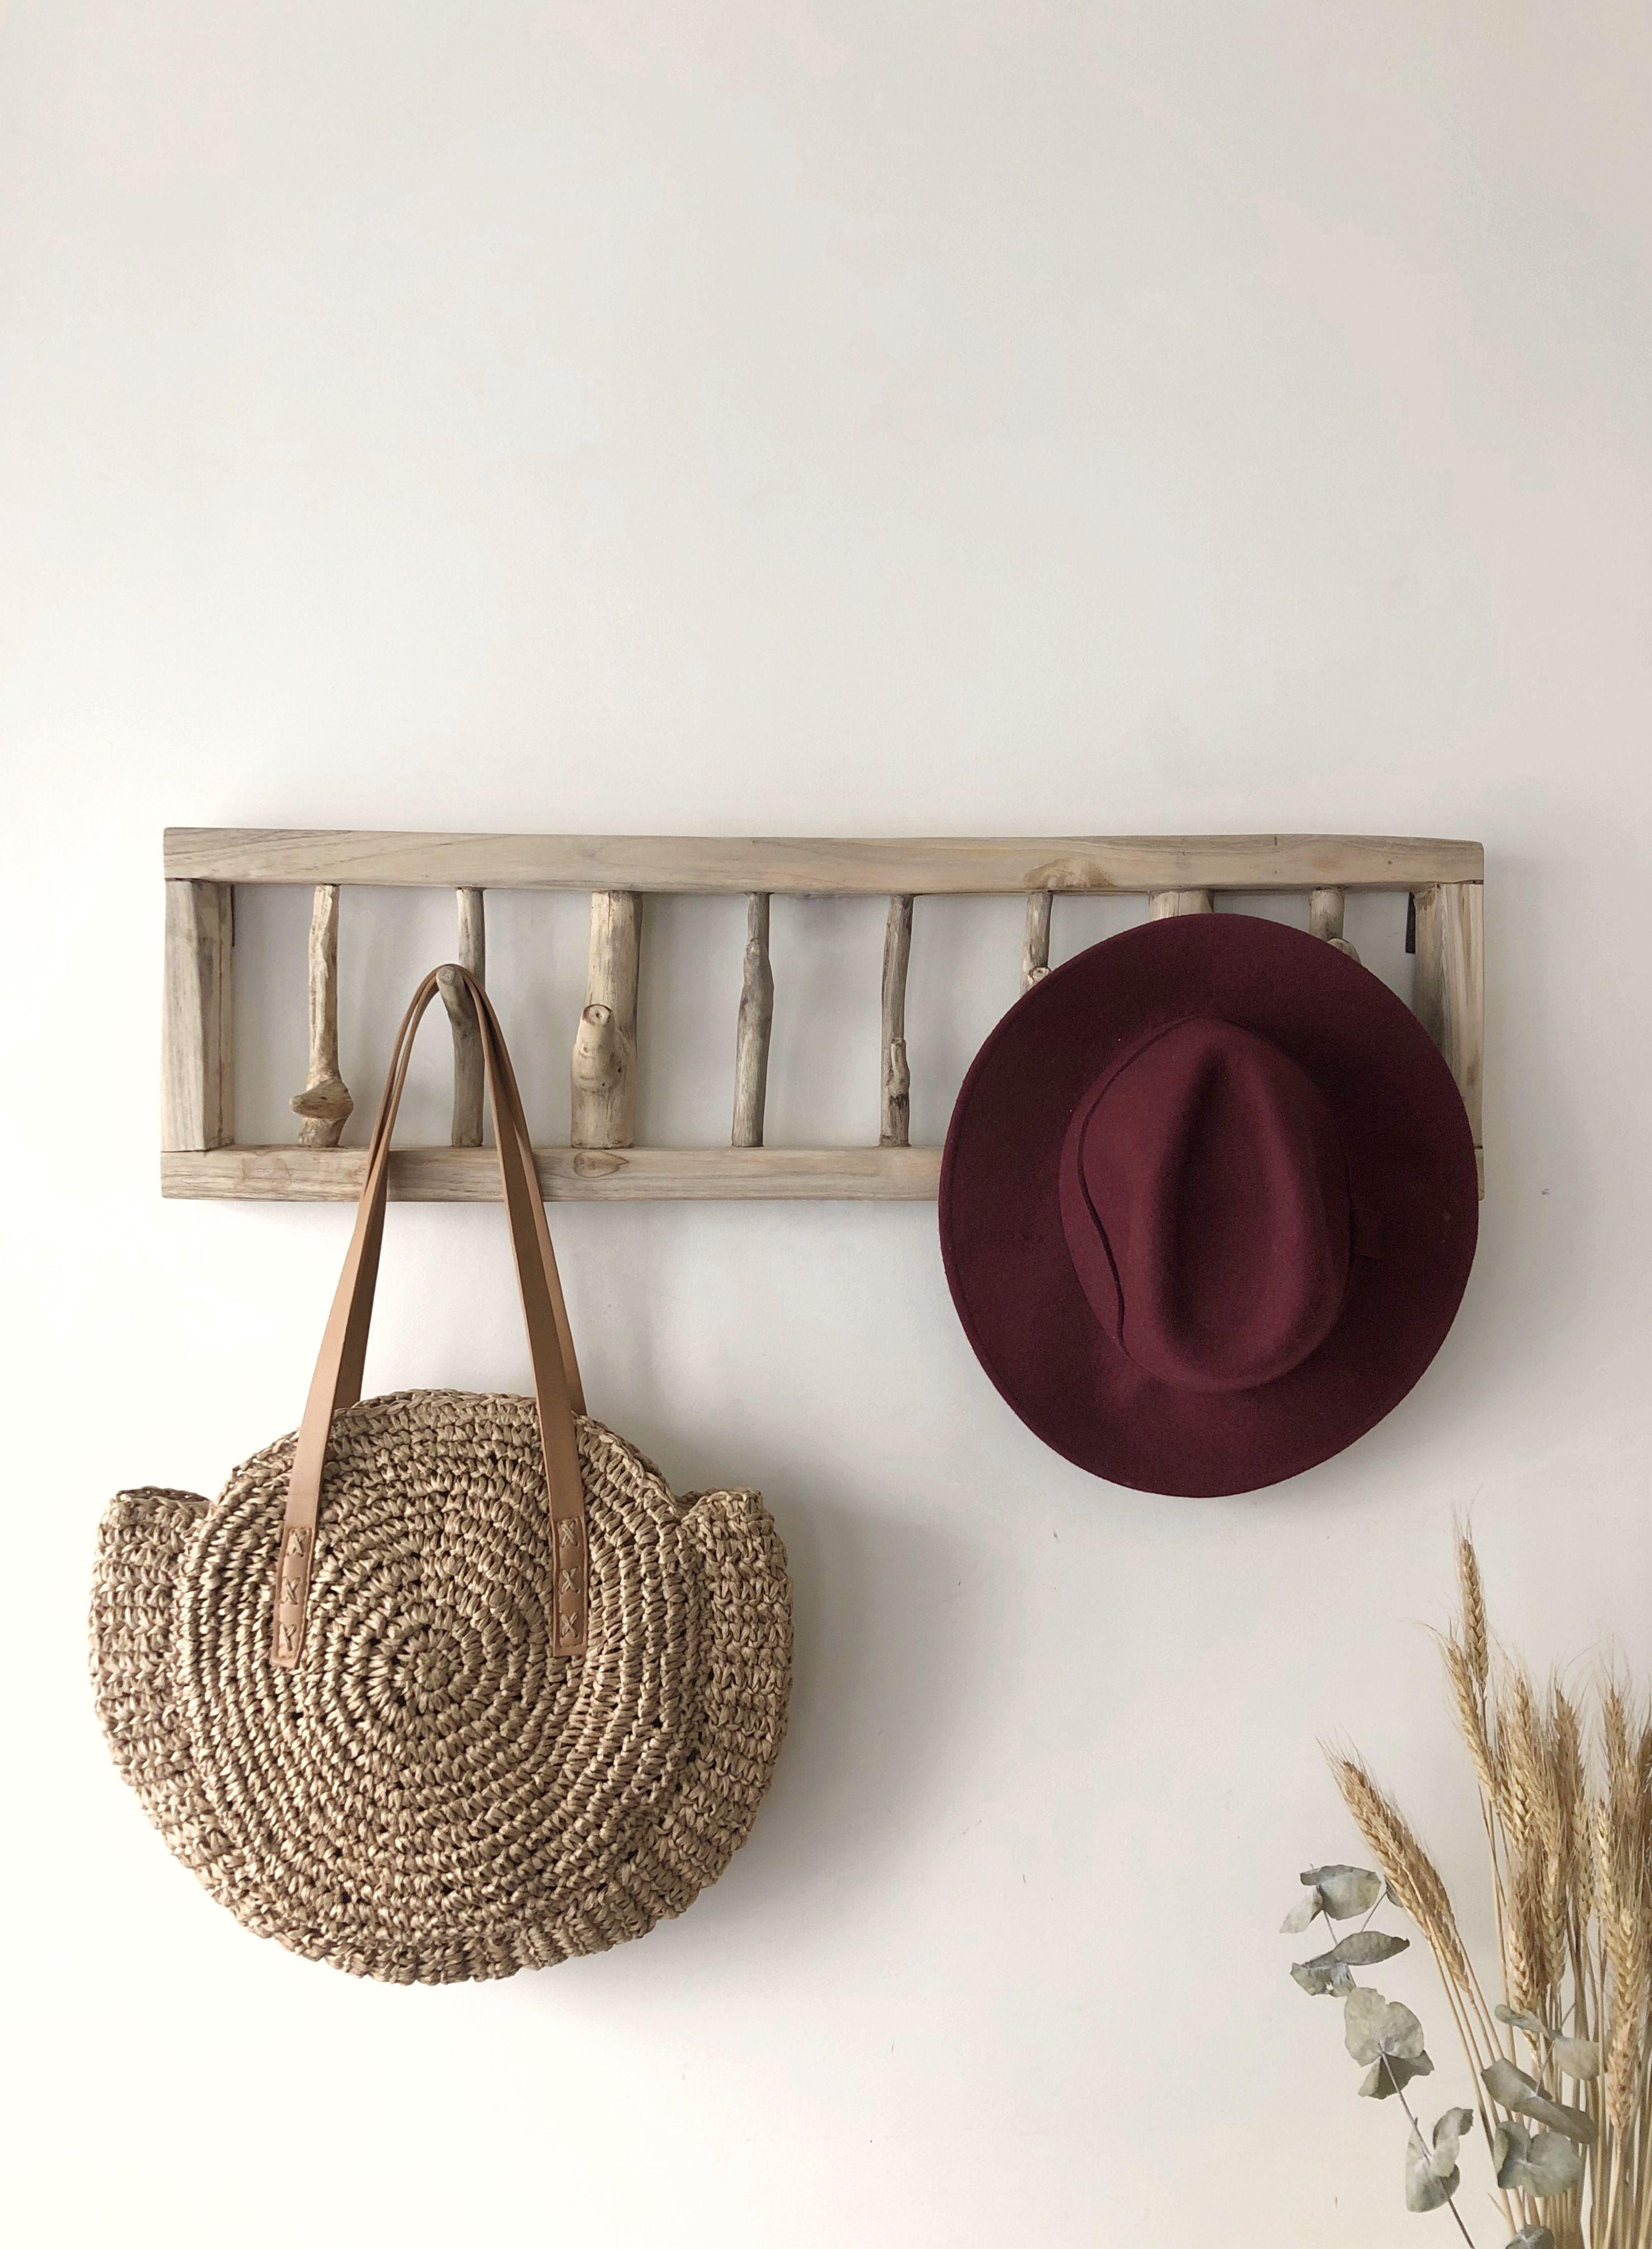 Wooden Coat Rack Floating Rustic Hook Wall Mounted Coat Etsy Wooden Coat Rack Wall Mounted Coat Rack Hat Wall